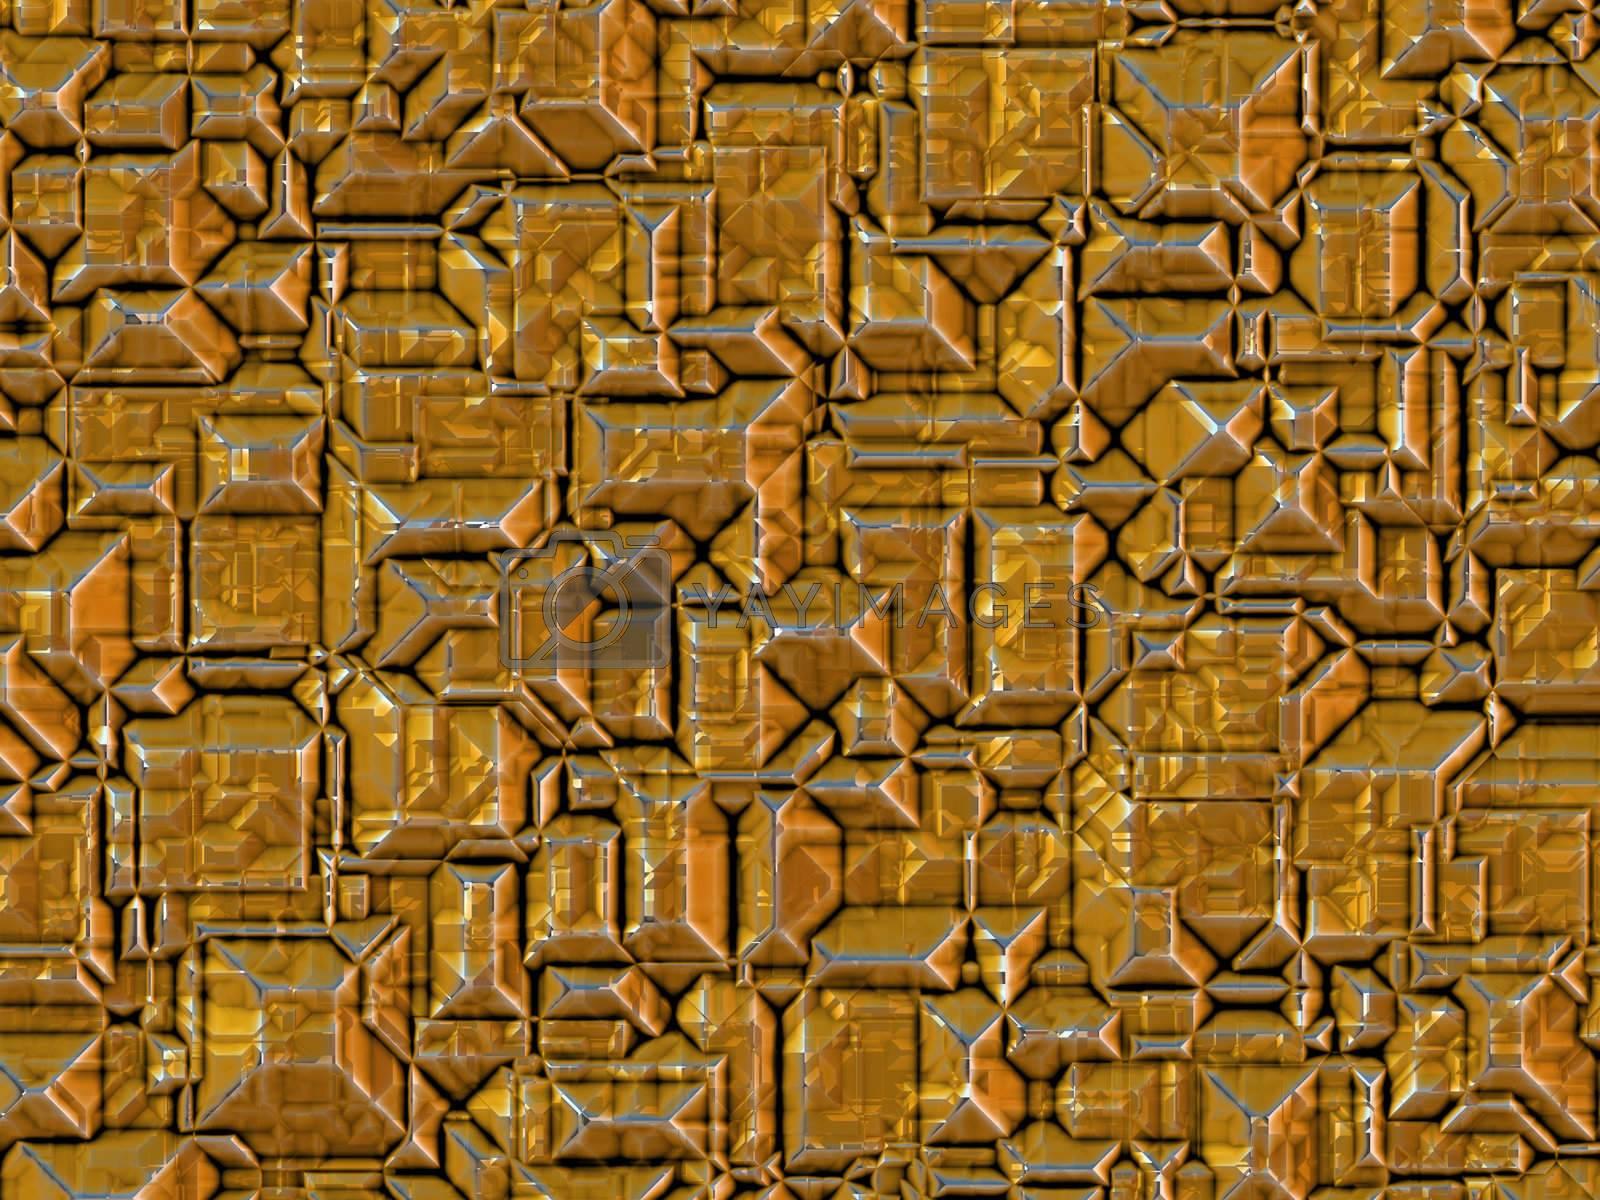 a rendering of an orange metallic background